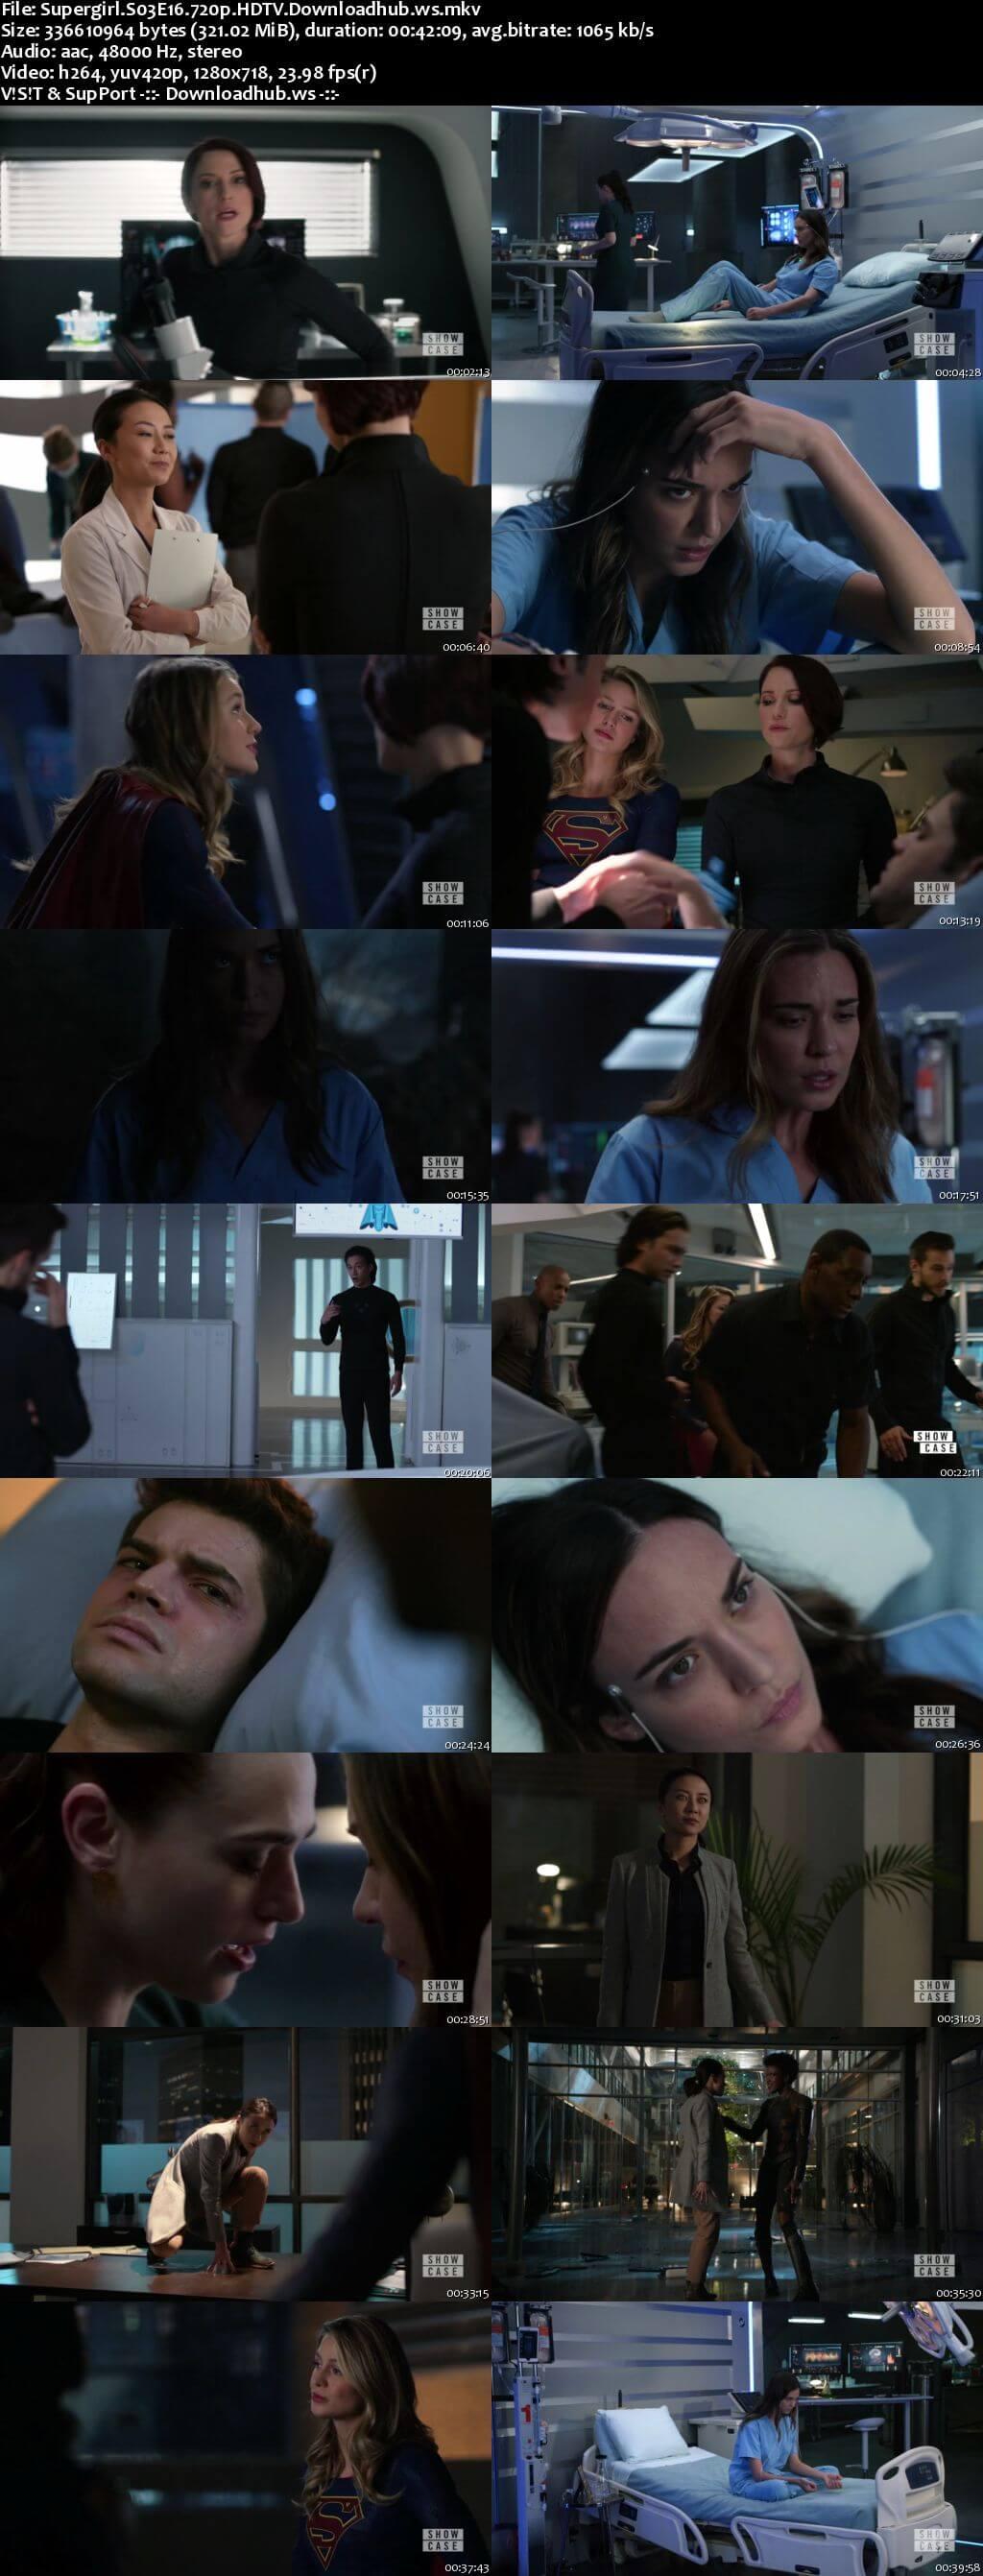 Supergirl S03E16 321MB HDTV 720p x264